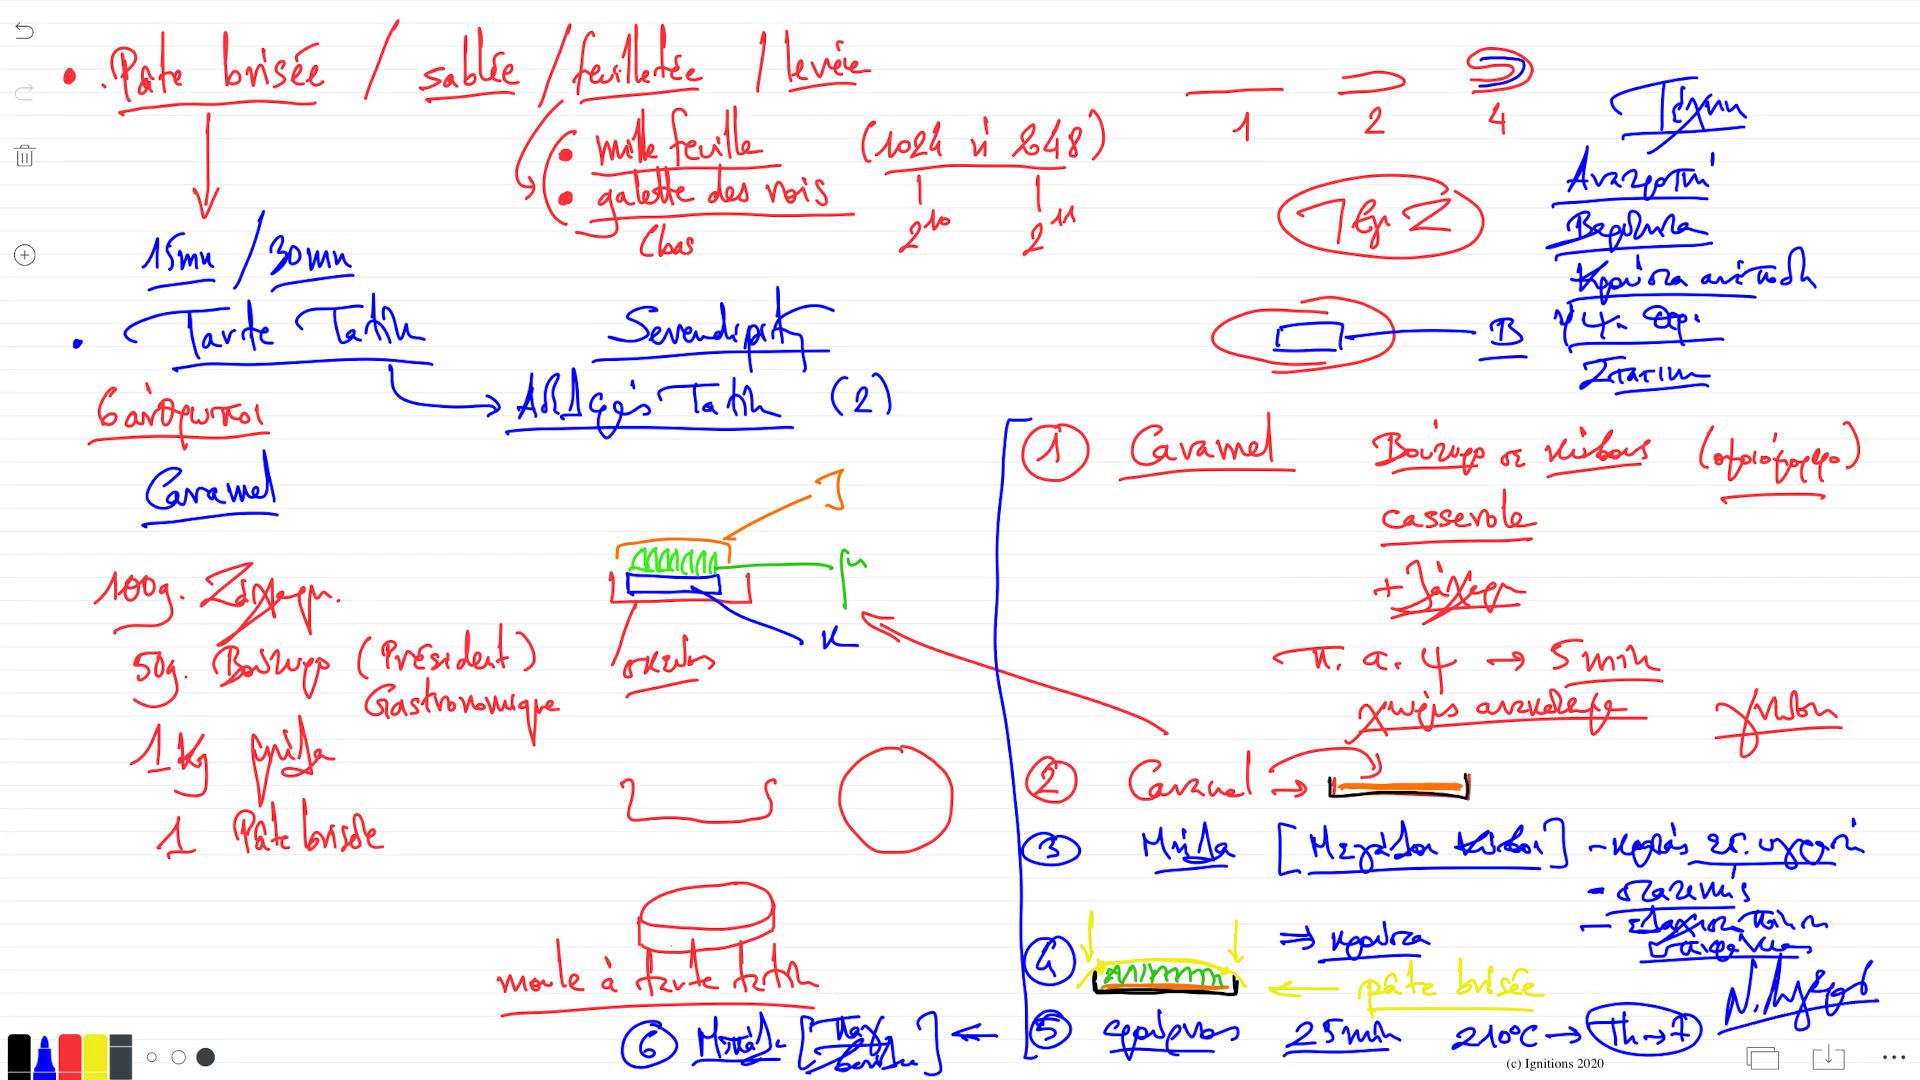 56528 - e-Μάθημα:Structure et Recette de la Tarte Tatin. (Dessin)